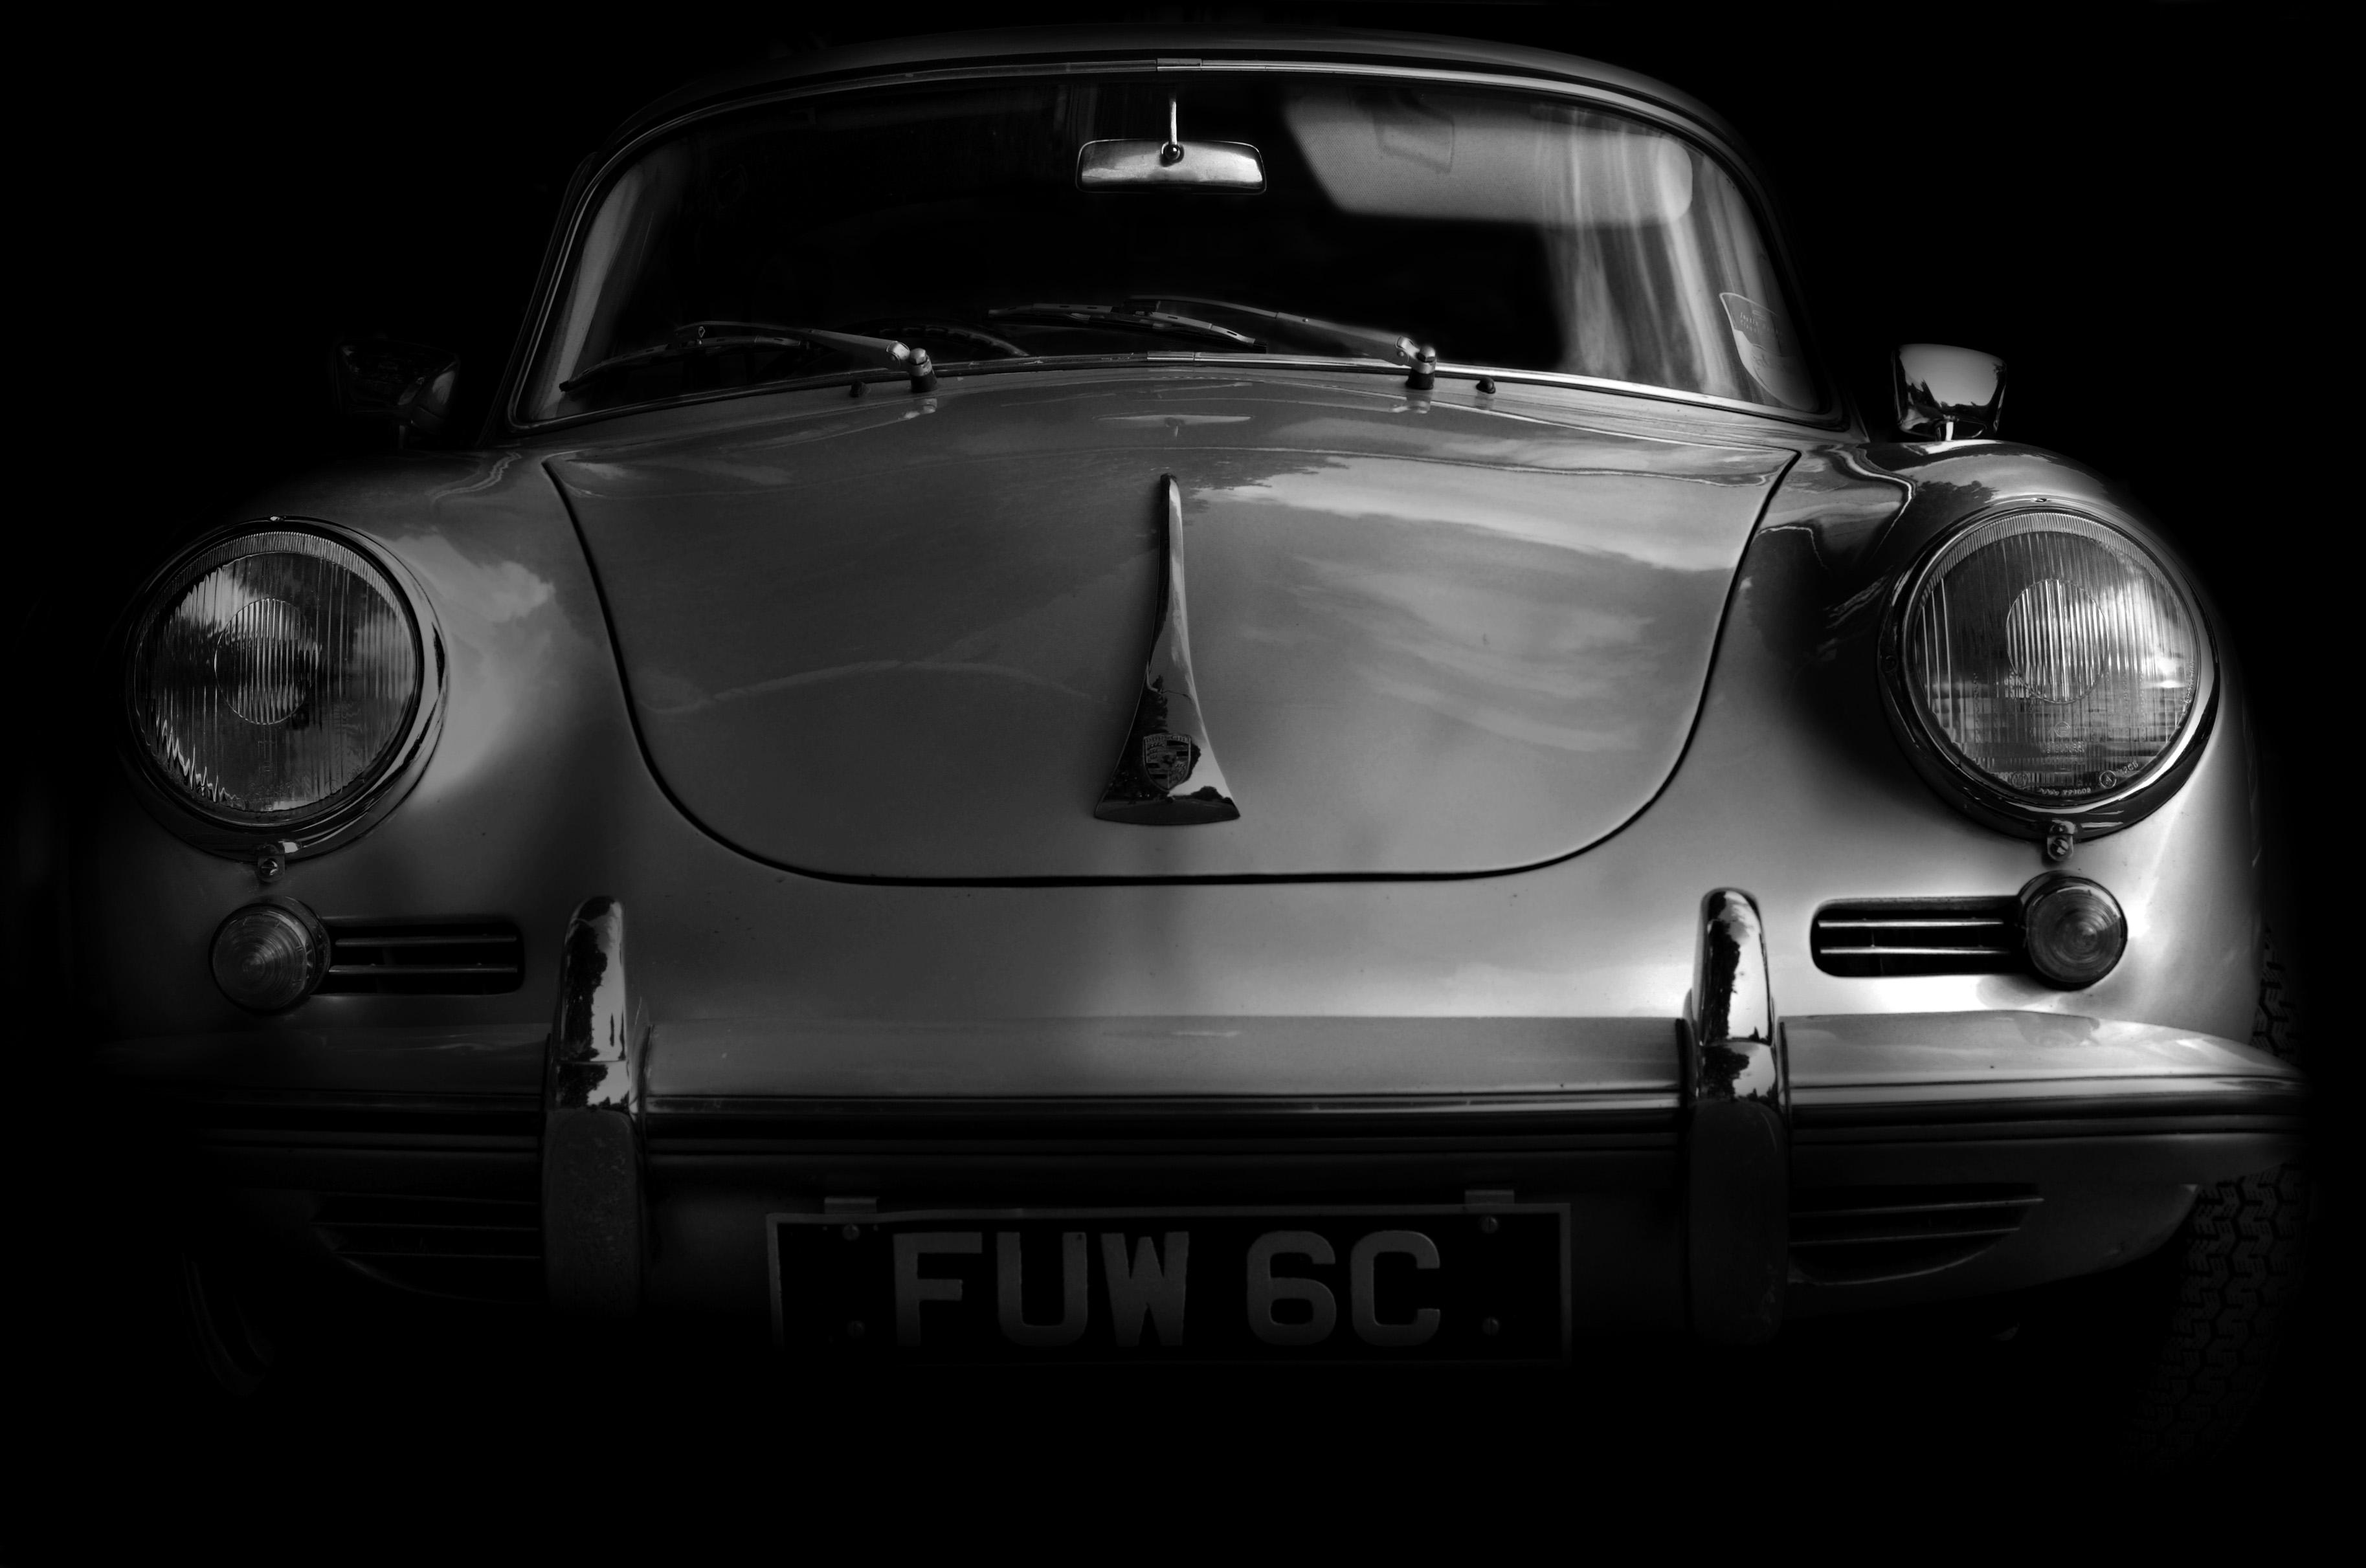 Wallpaper : Canon, Sports Car, Vintage Car, Classic Car